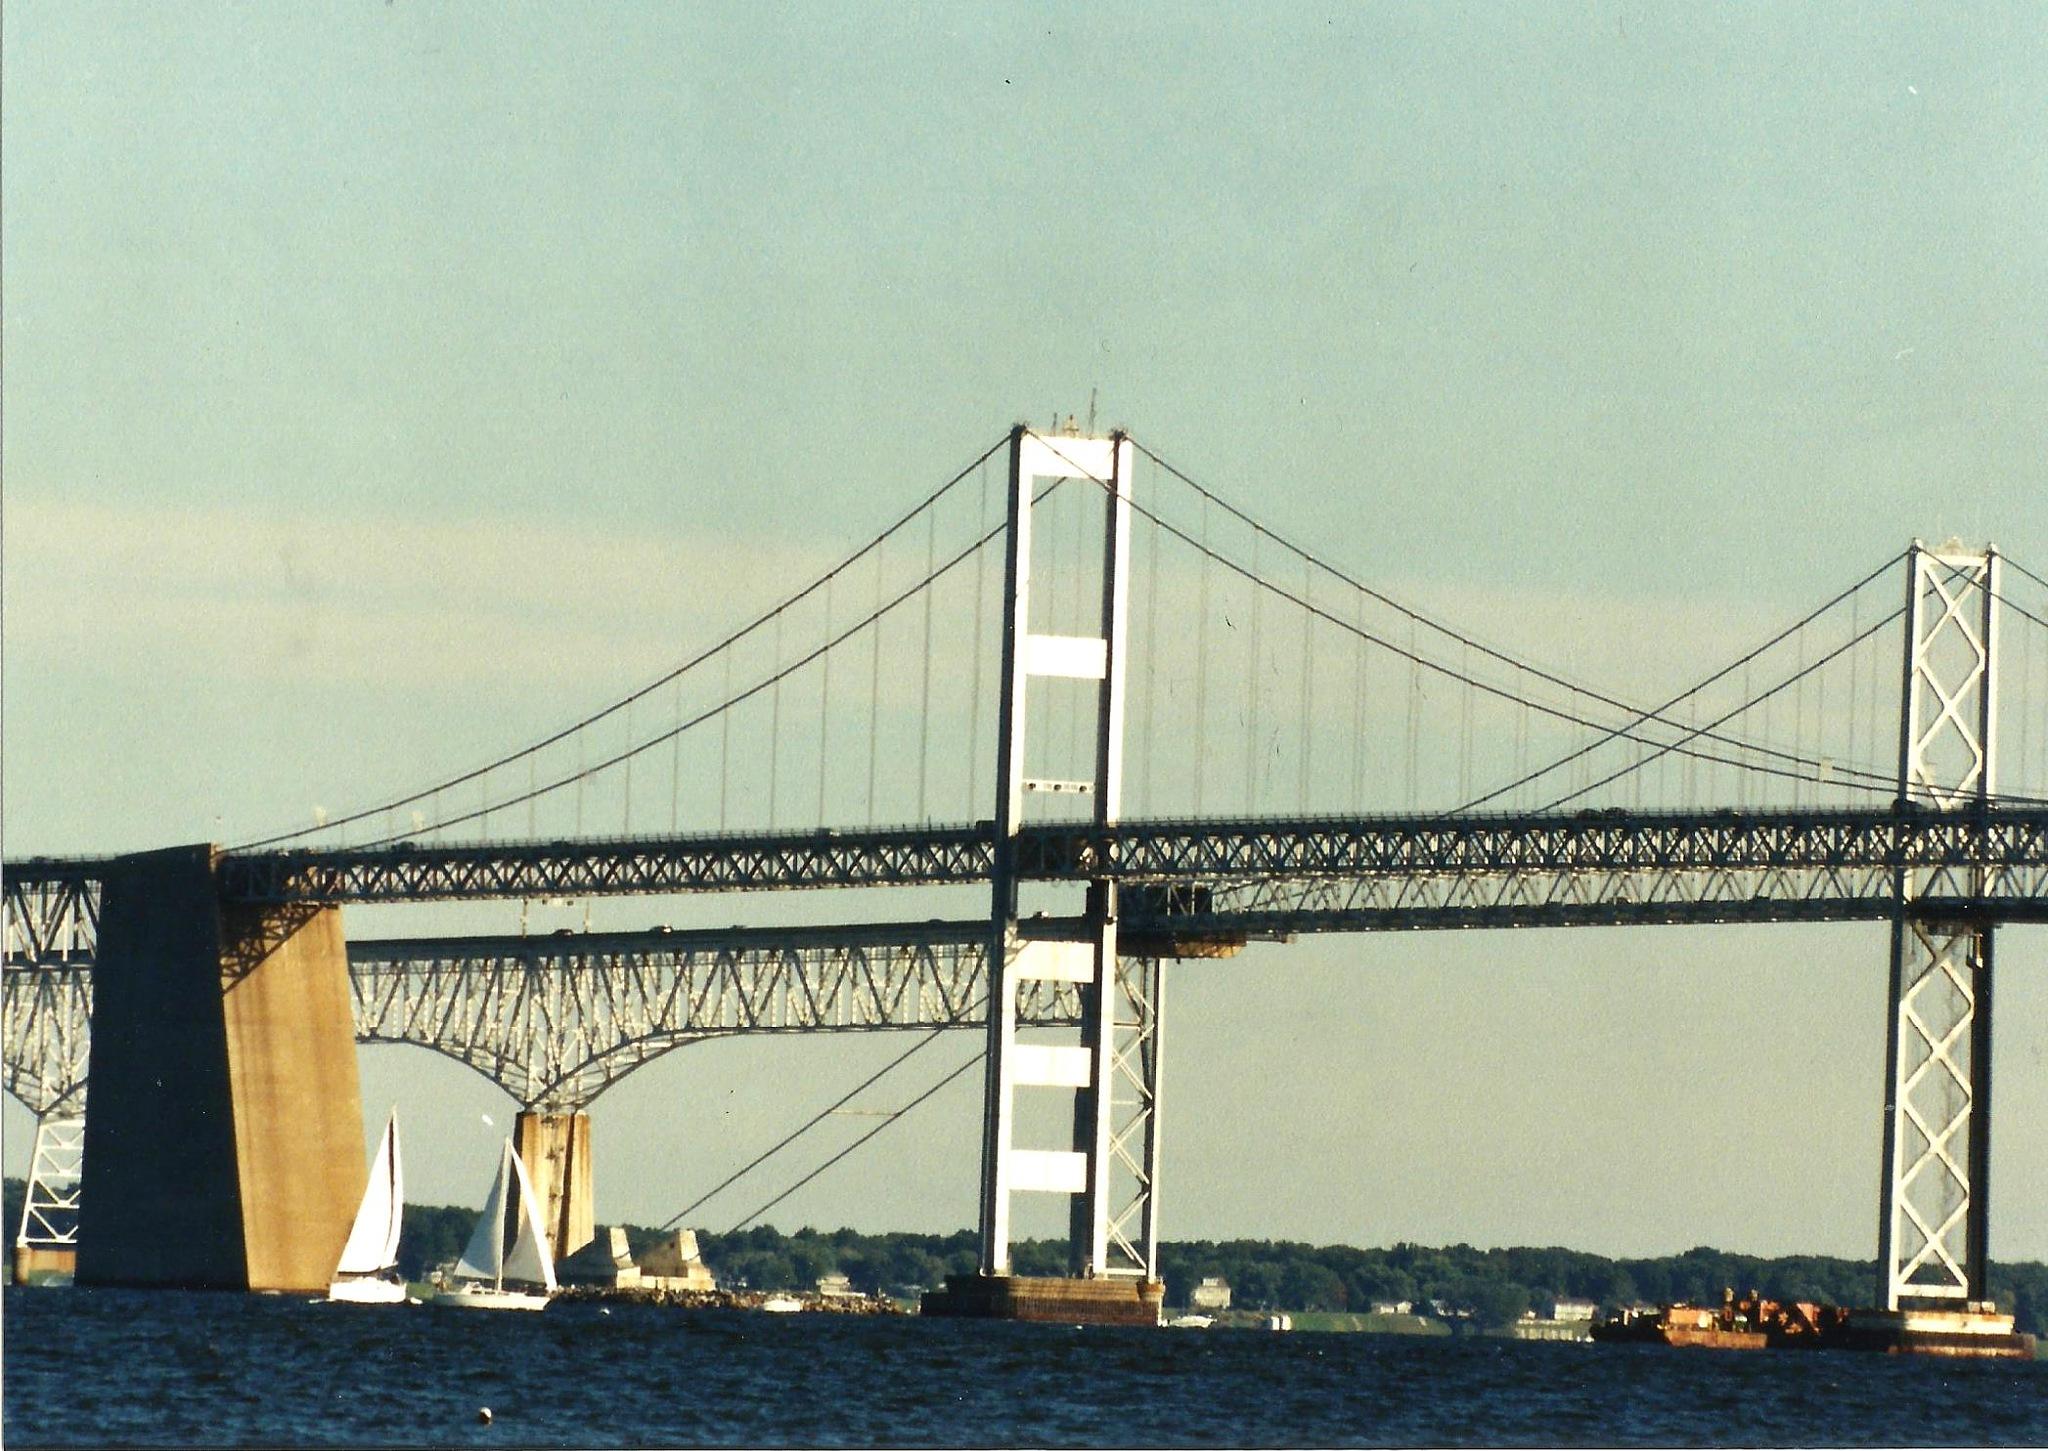 THE CHESAPEAKE BAY BRIDGE by Hope Atwood Dayhoff